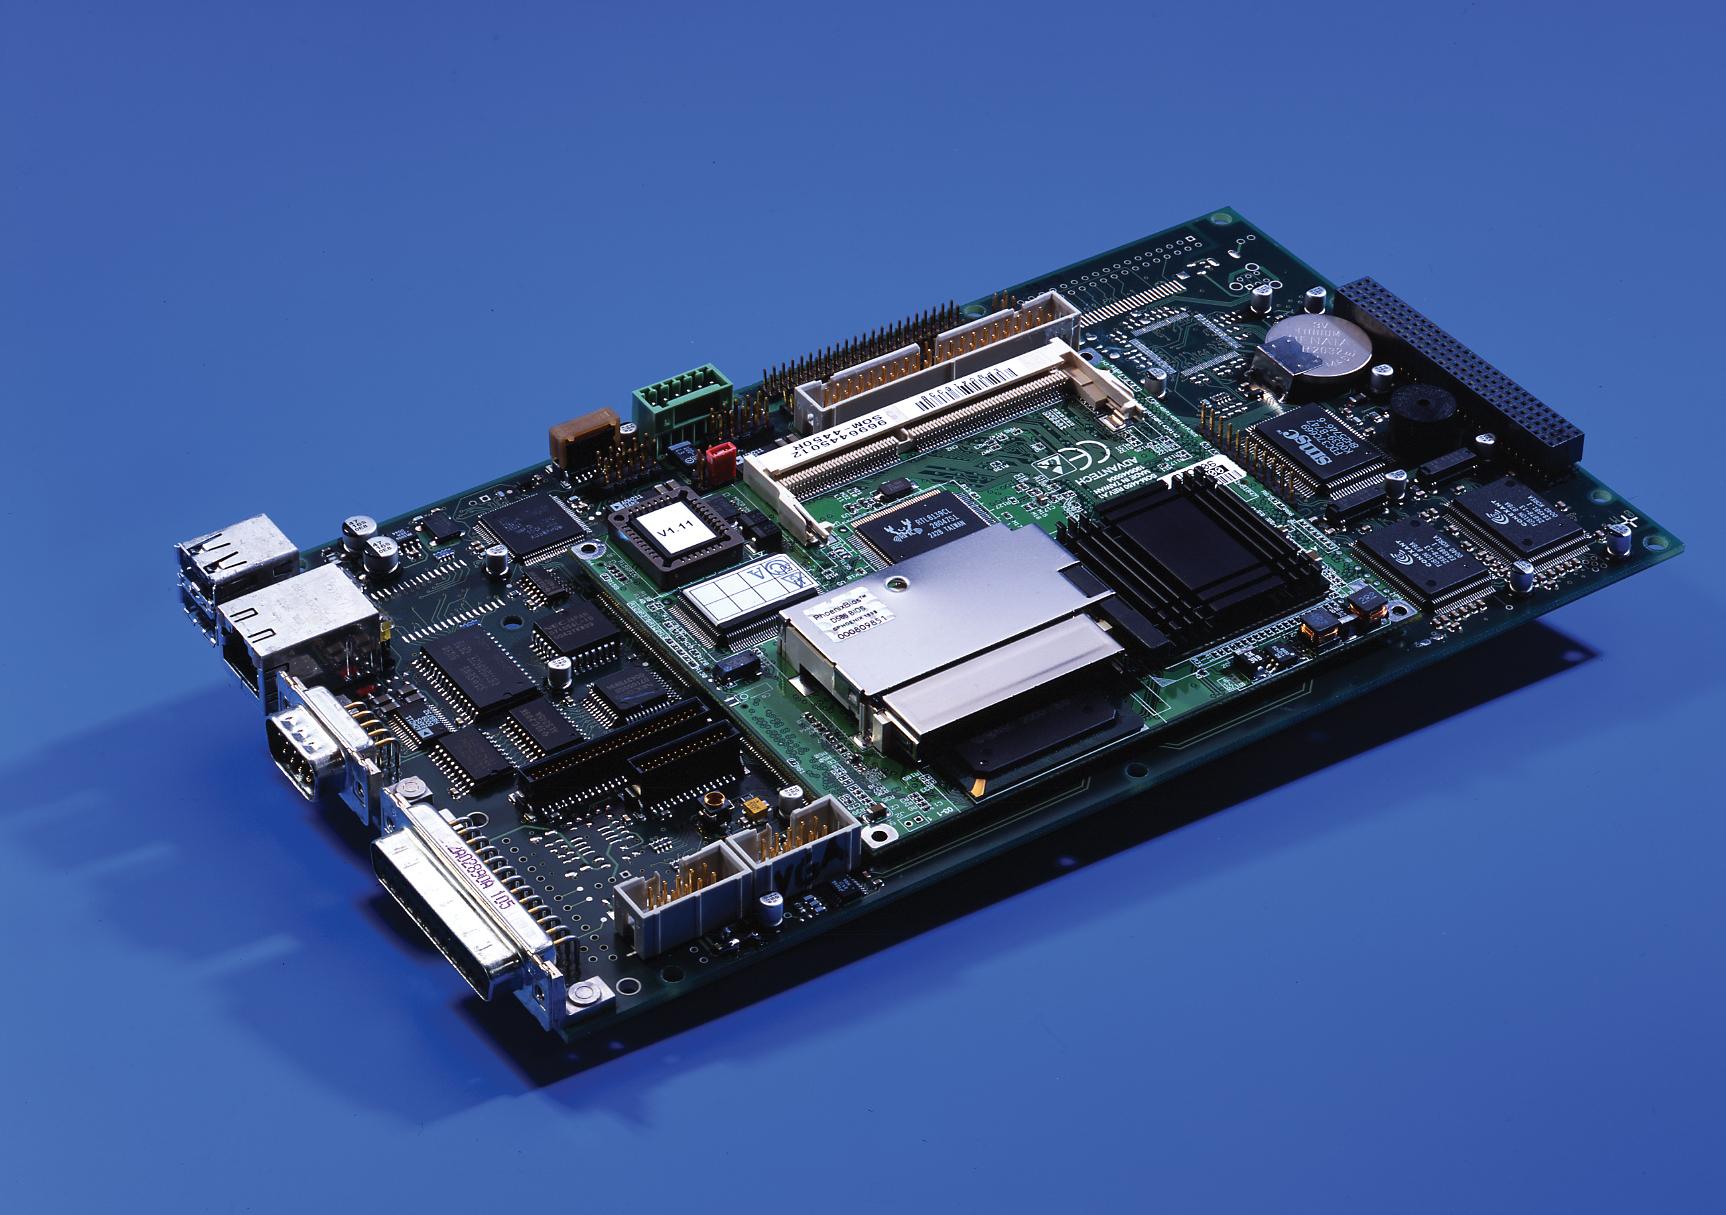 Https Inaktiv Broadcom Ca Uebernimmt Usb Campod Breakout Board For Cnc Machine Control Image1